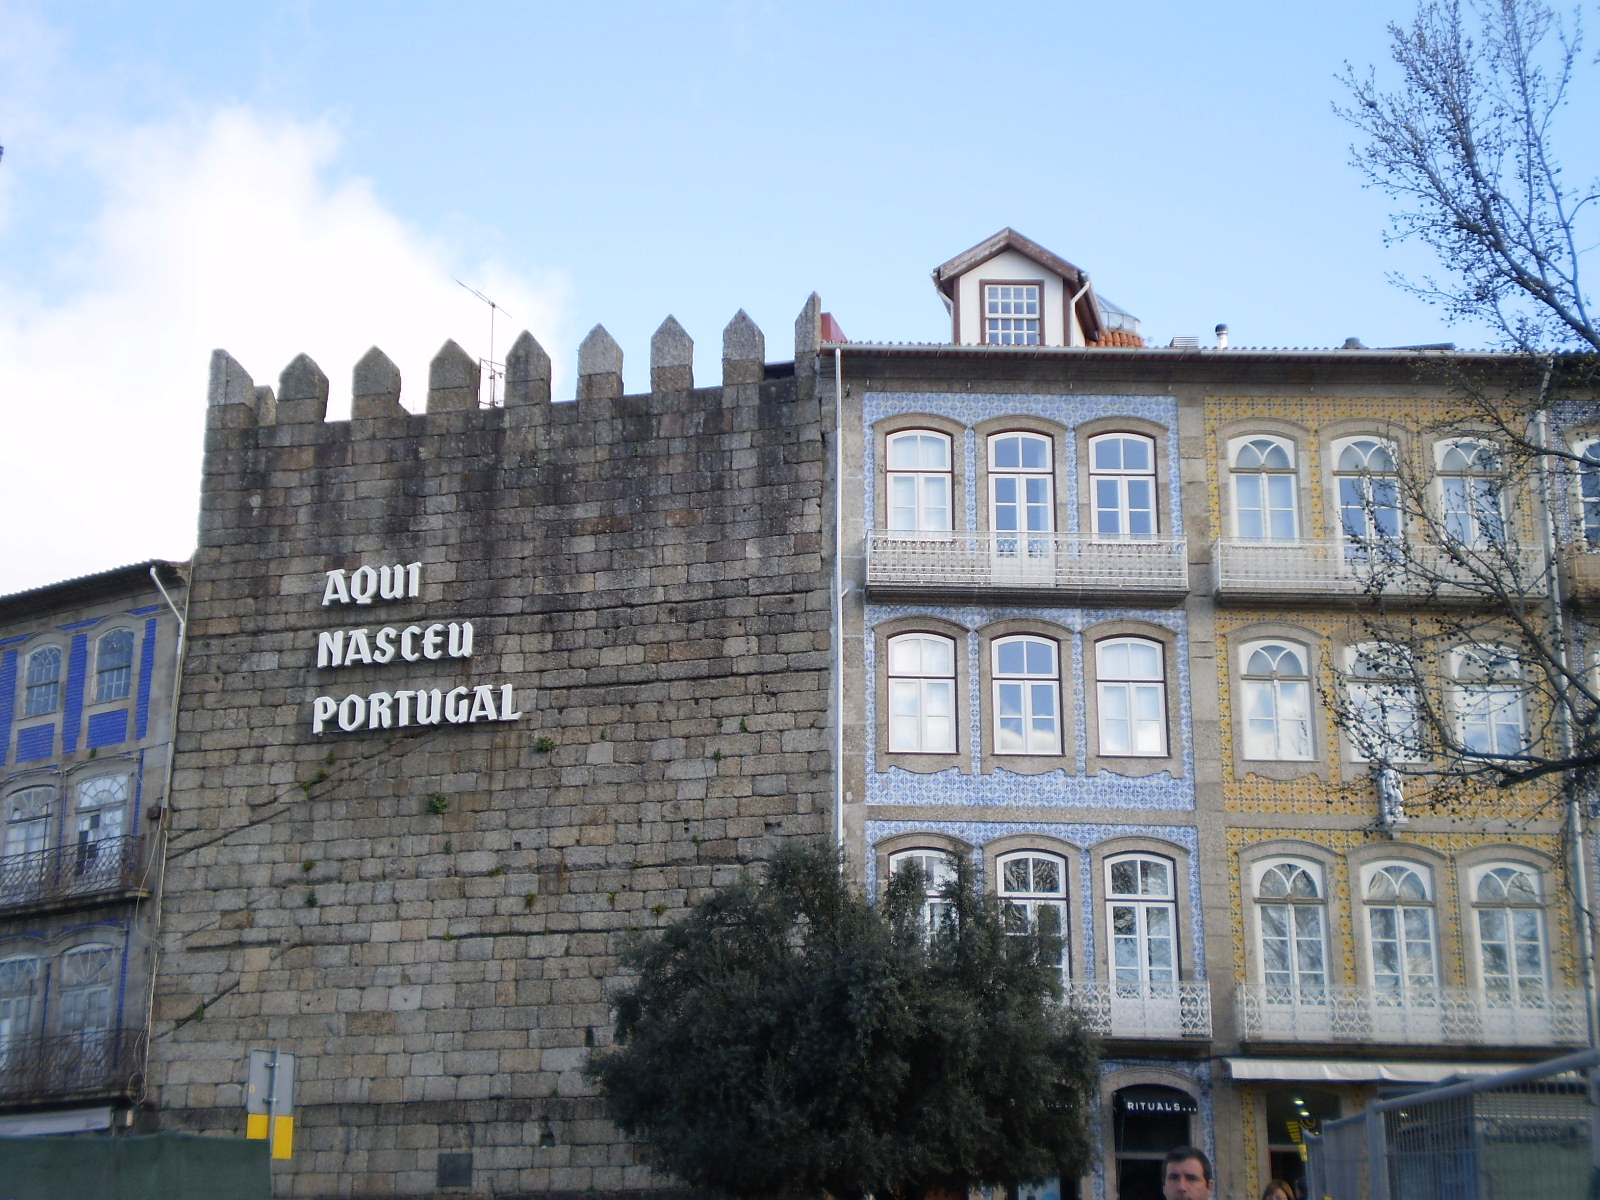 Guimaraes Portugal  city photos gallery : Guimaraes Portugal